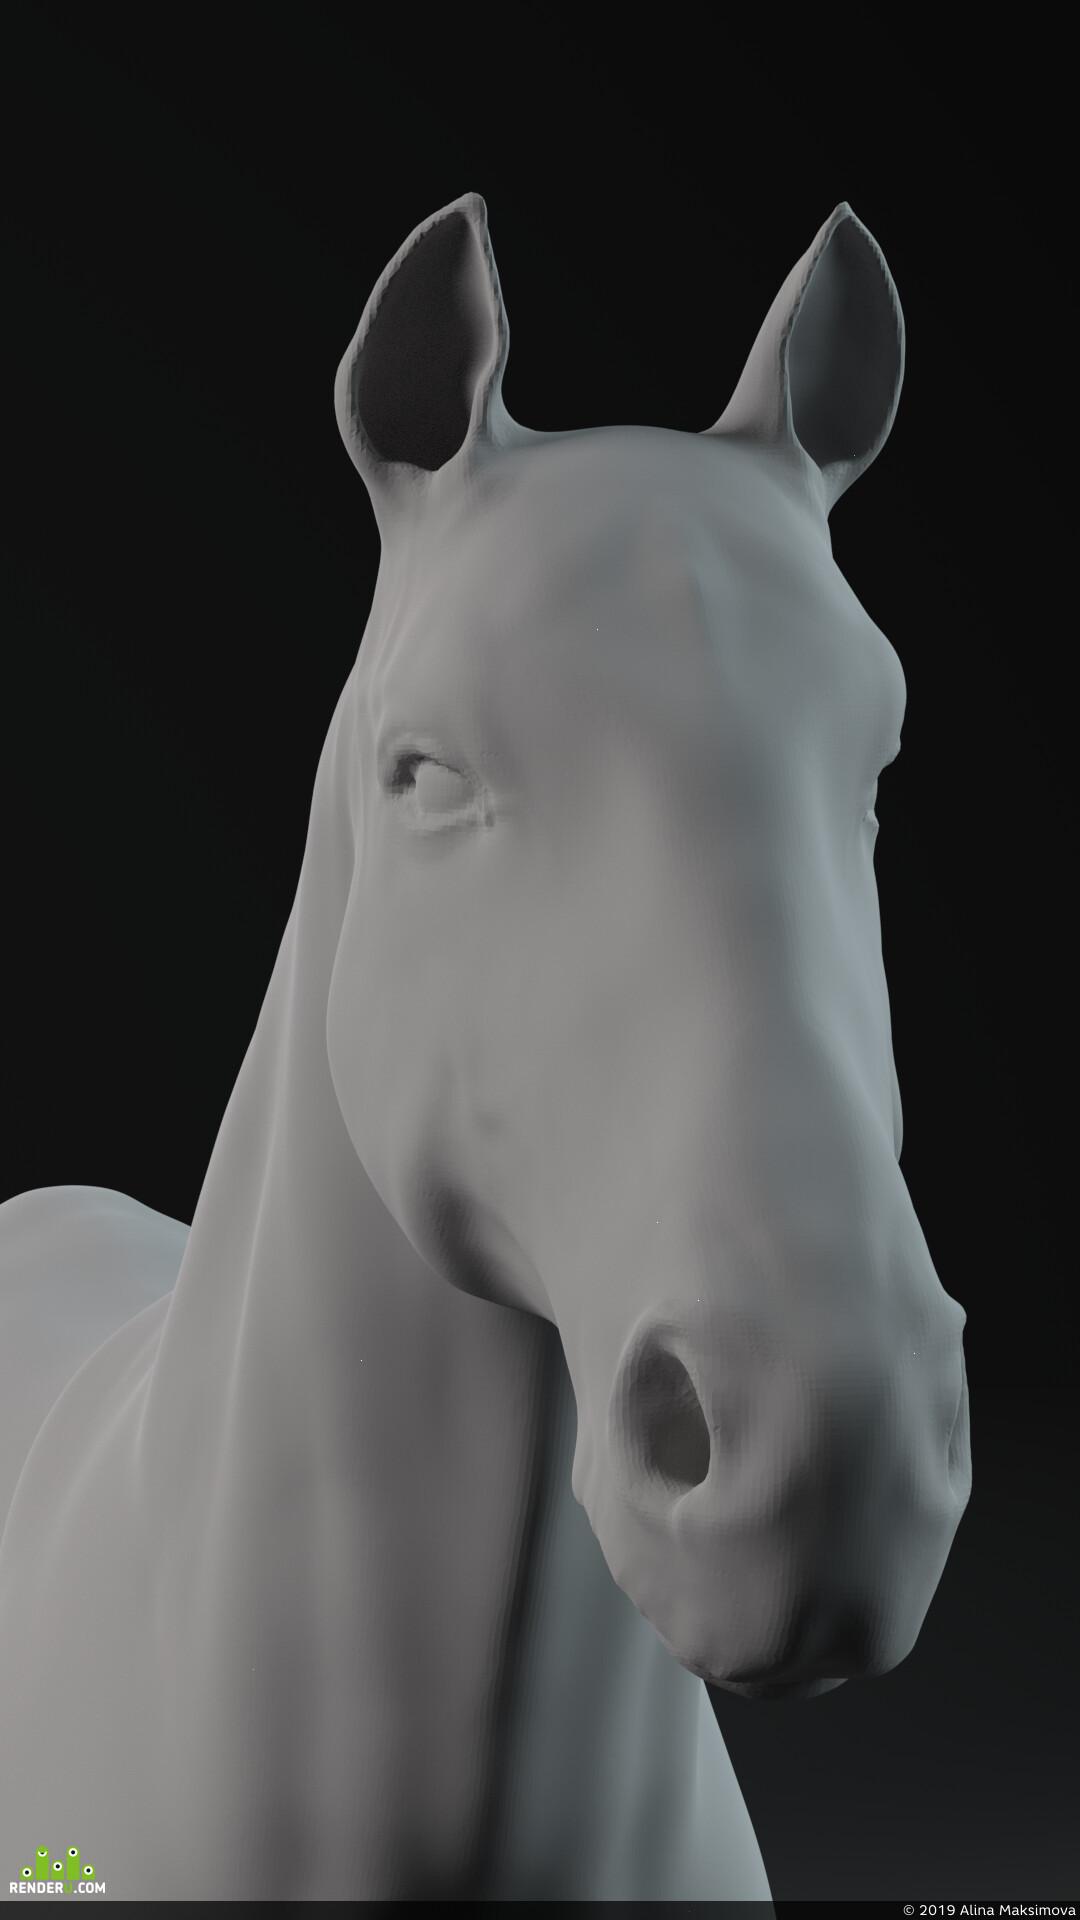 horse, animal